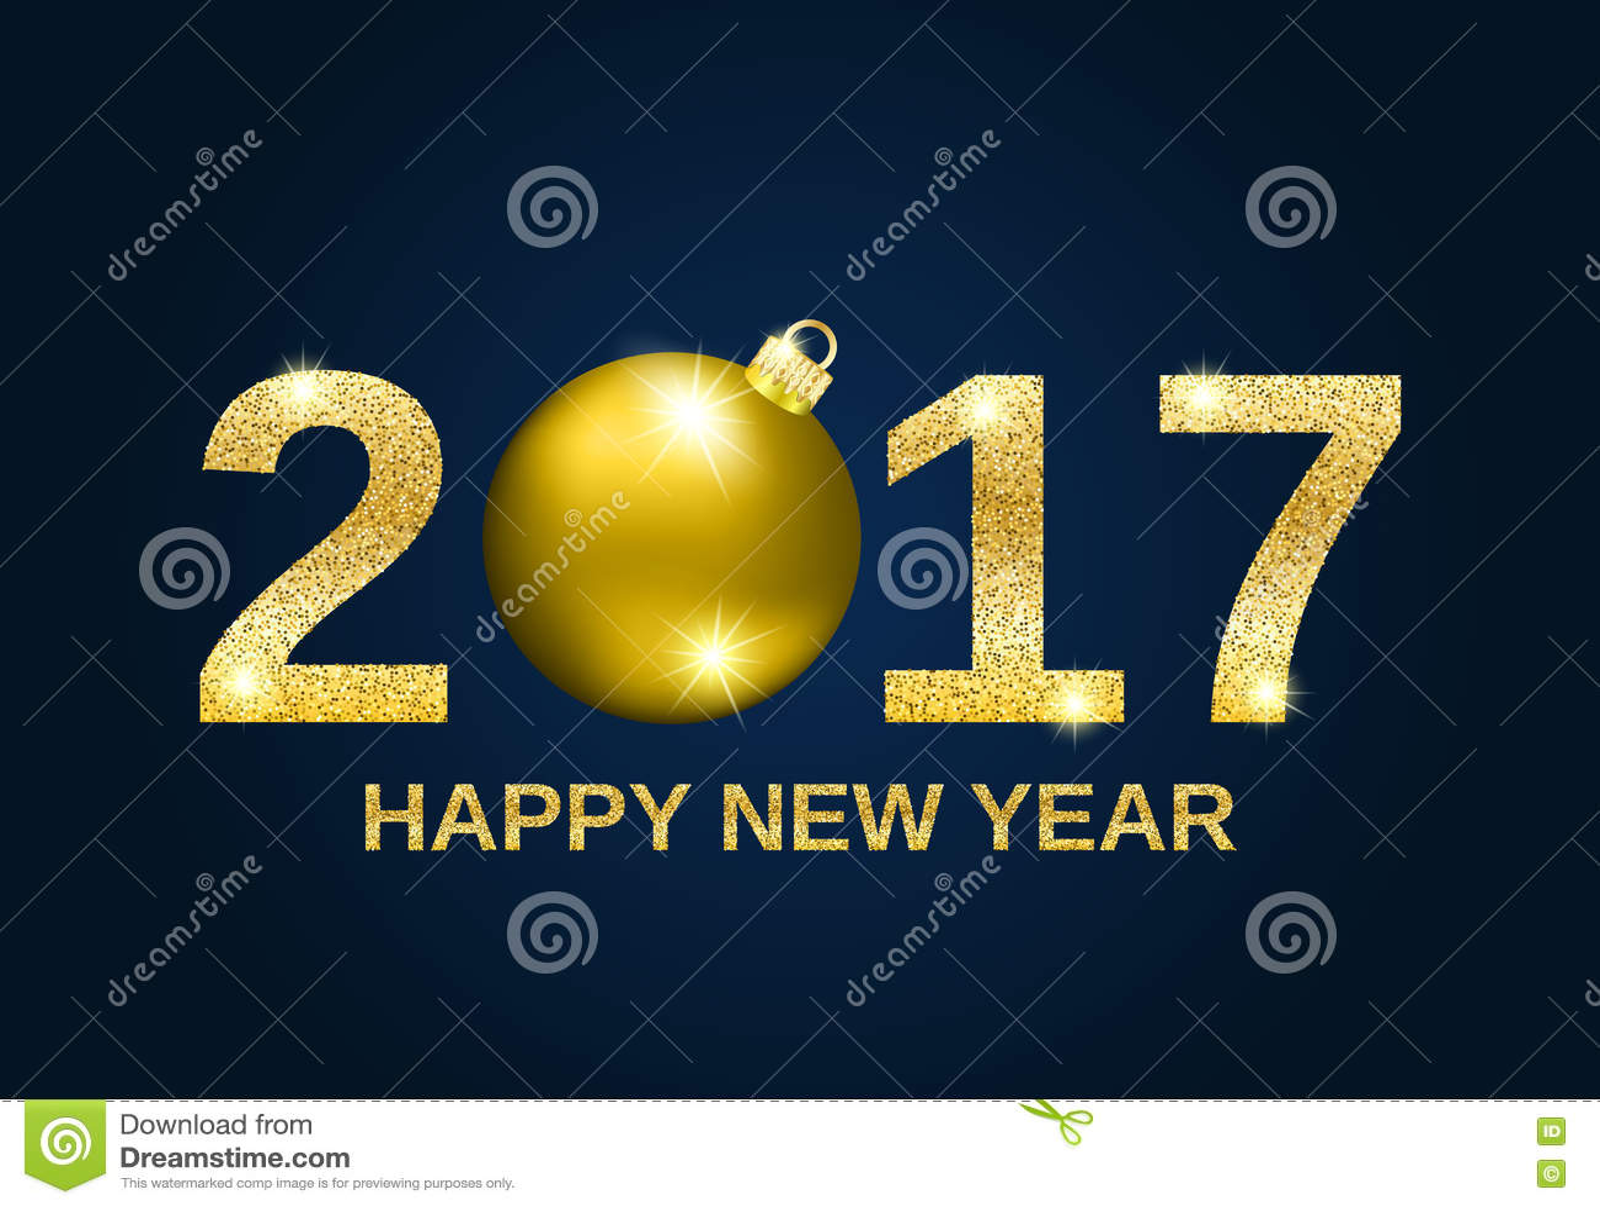 gold glitter happy new year 2017 background